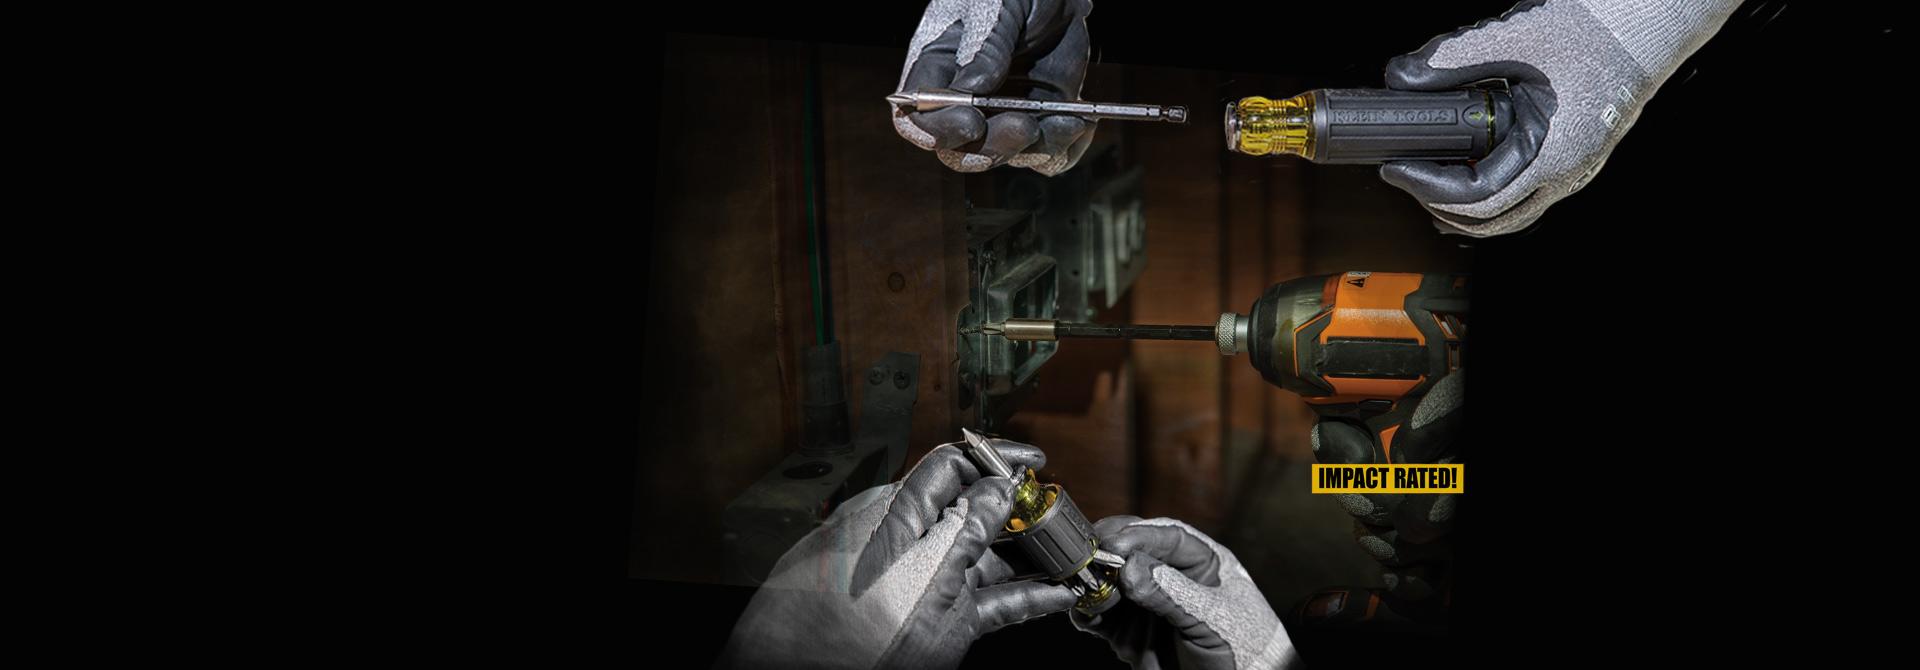 2 Adjustable \r\nMulti-Bit \r\nScrewdrivers